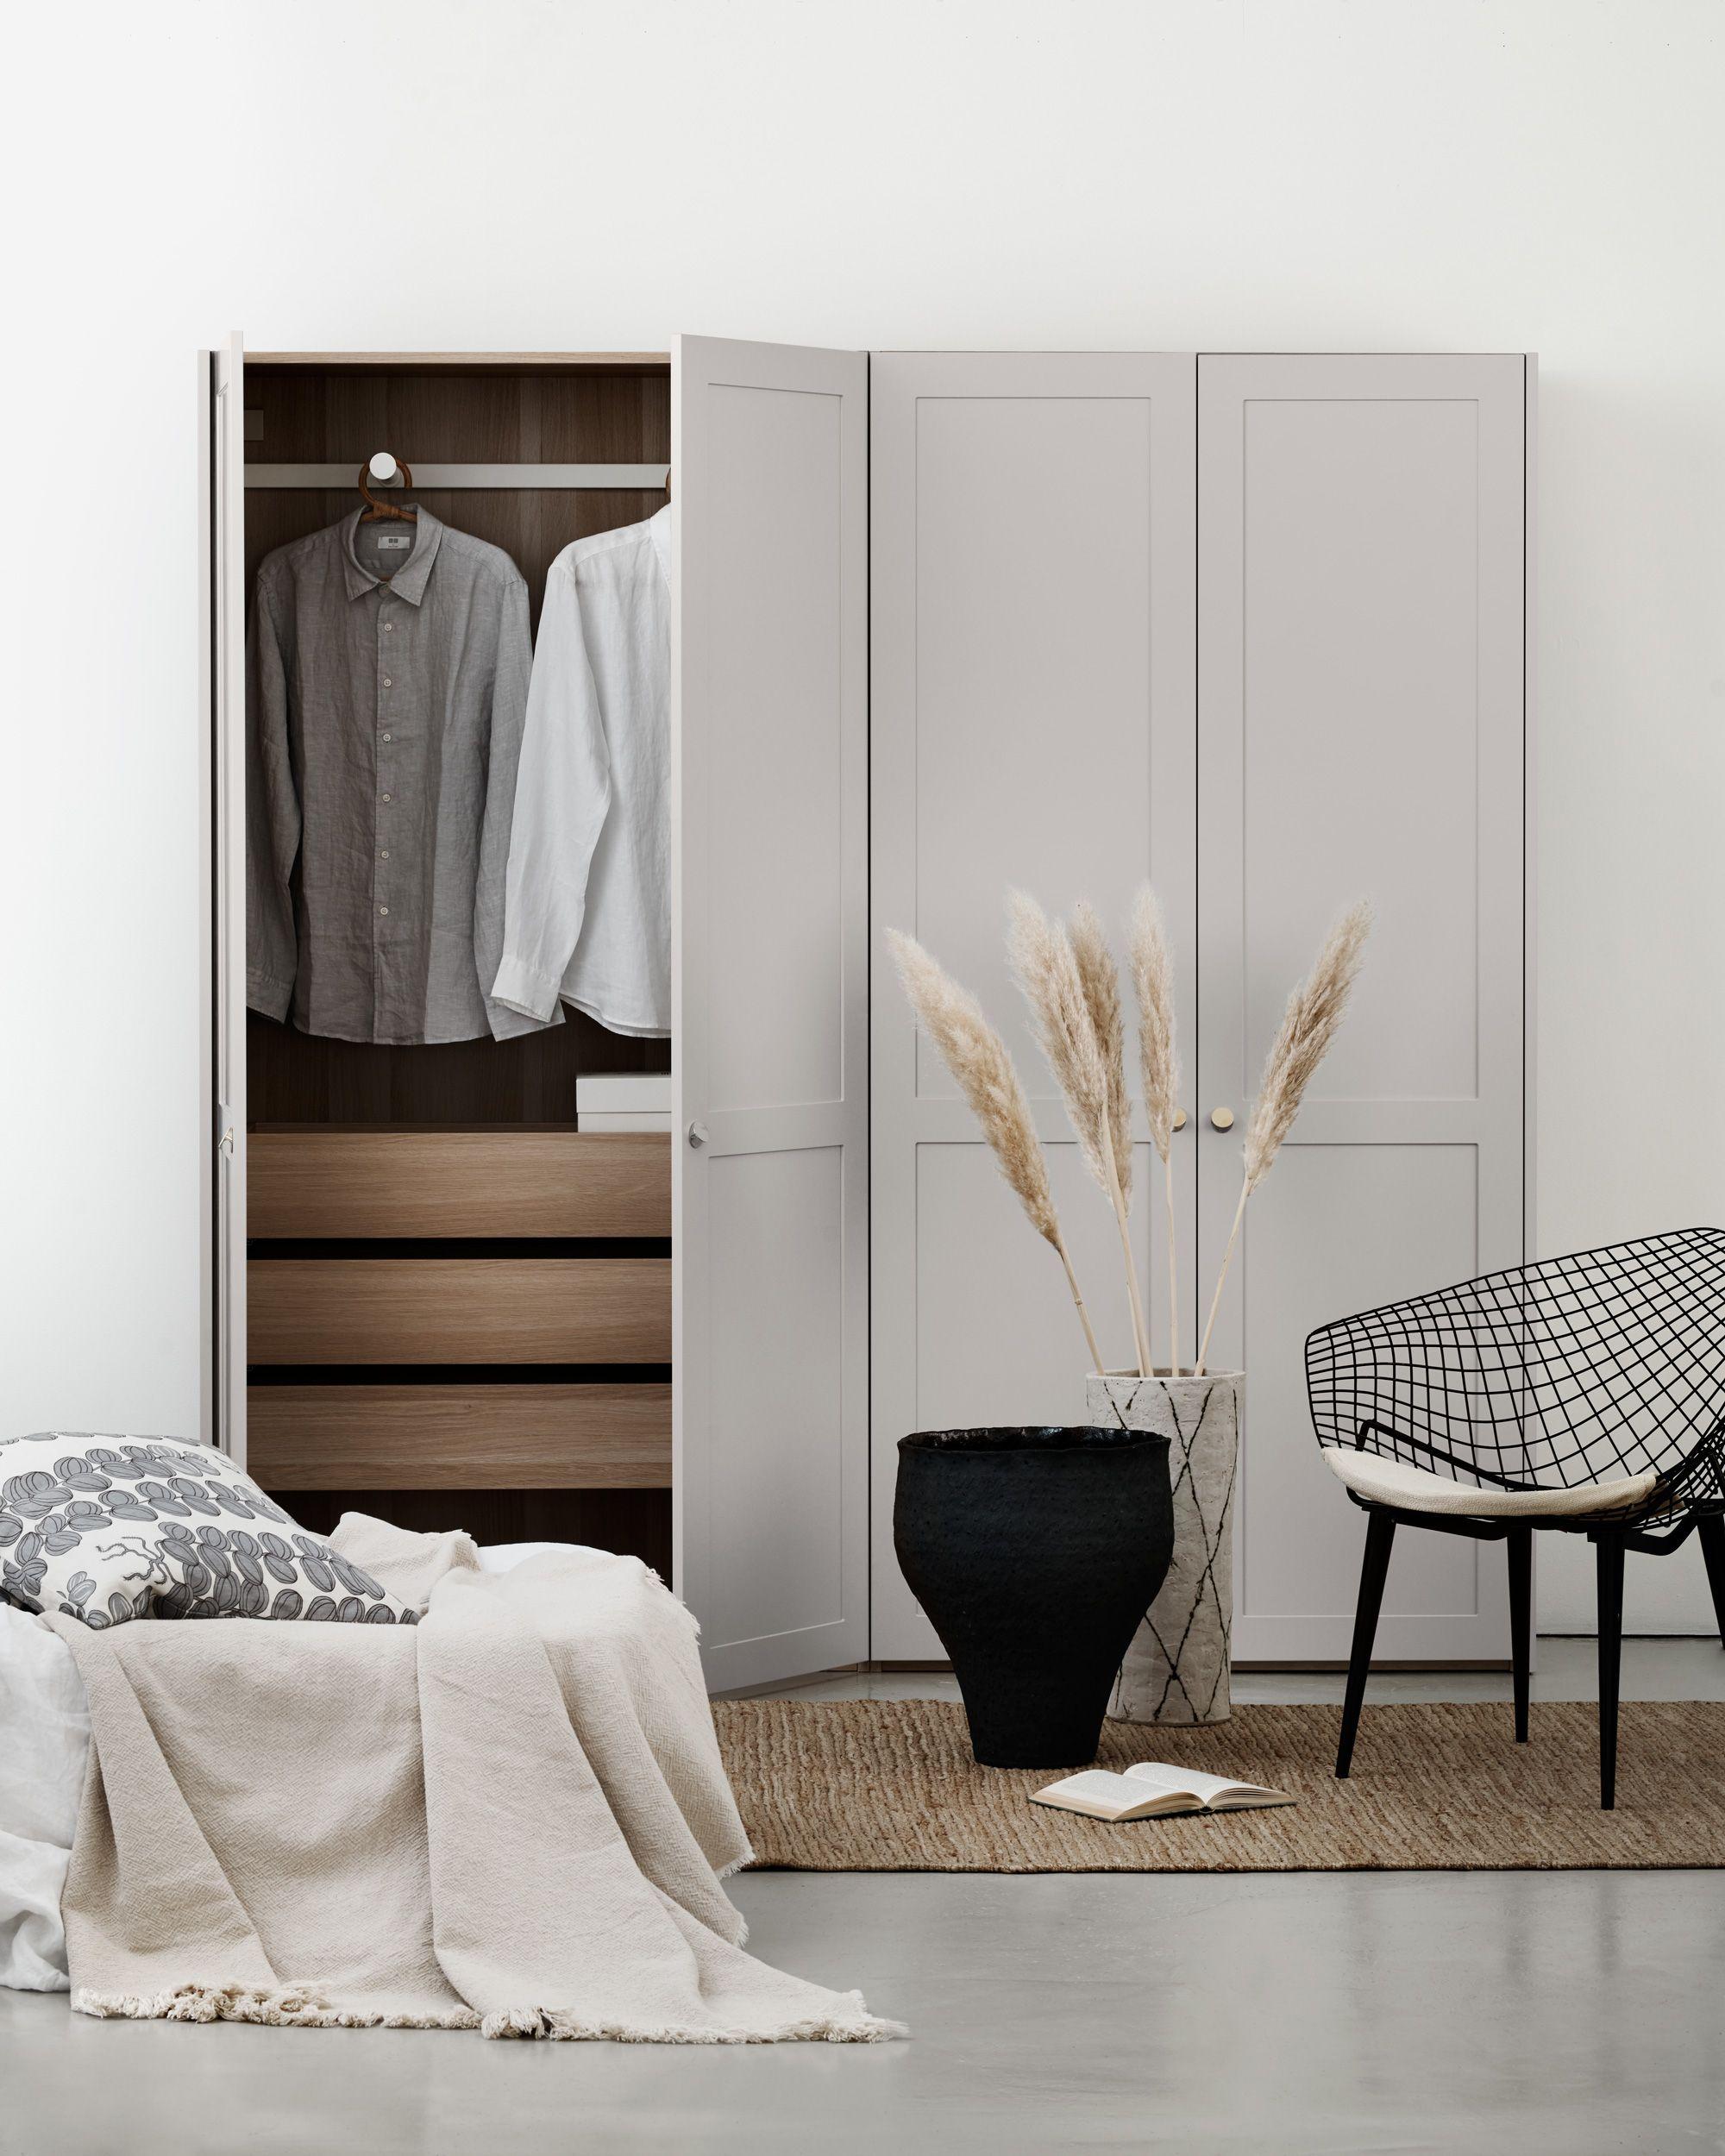 A.S.Helsingö Wardrobes / ENSIÖ   Bedroom decor design, Home decor ...